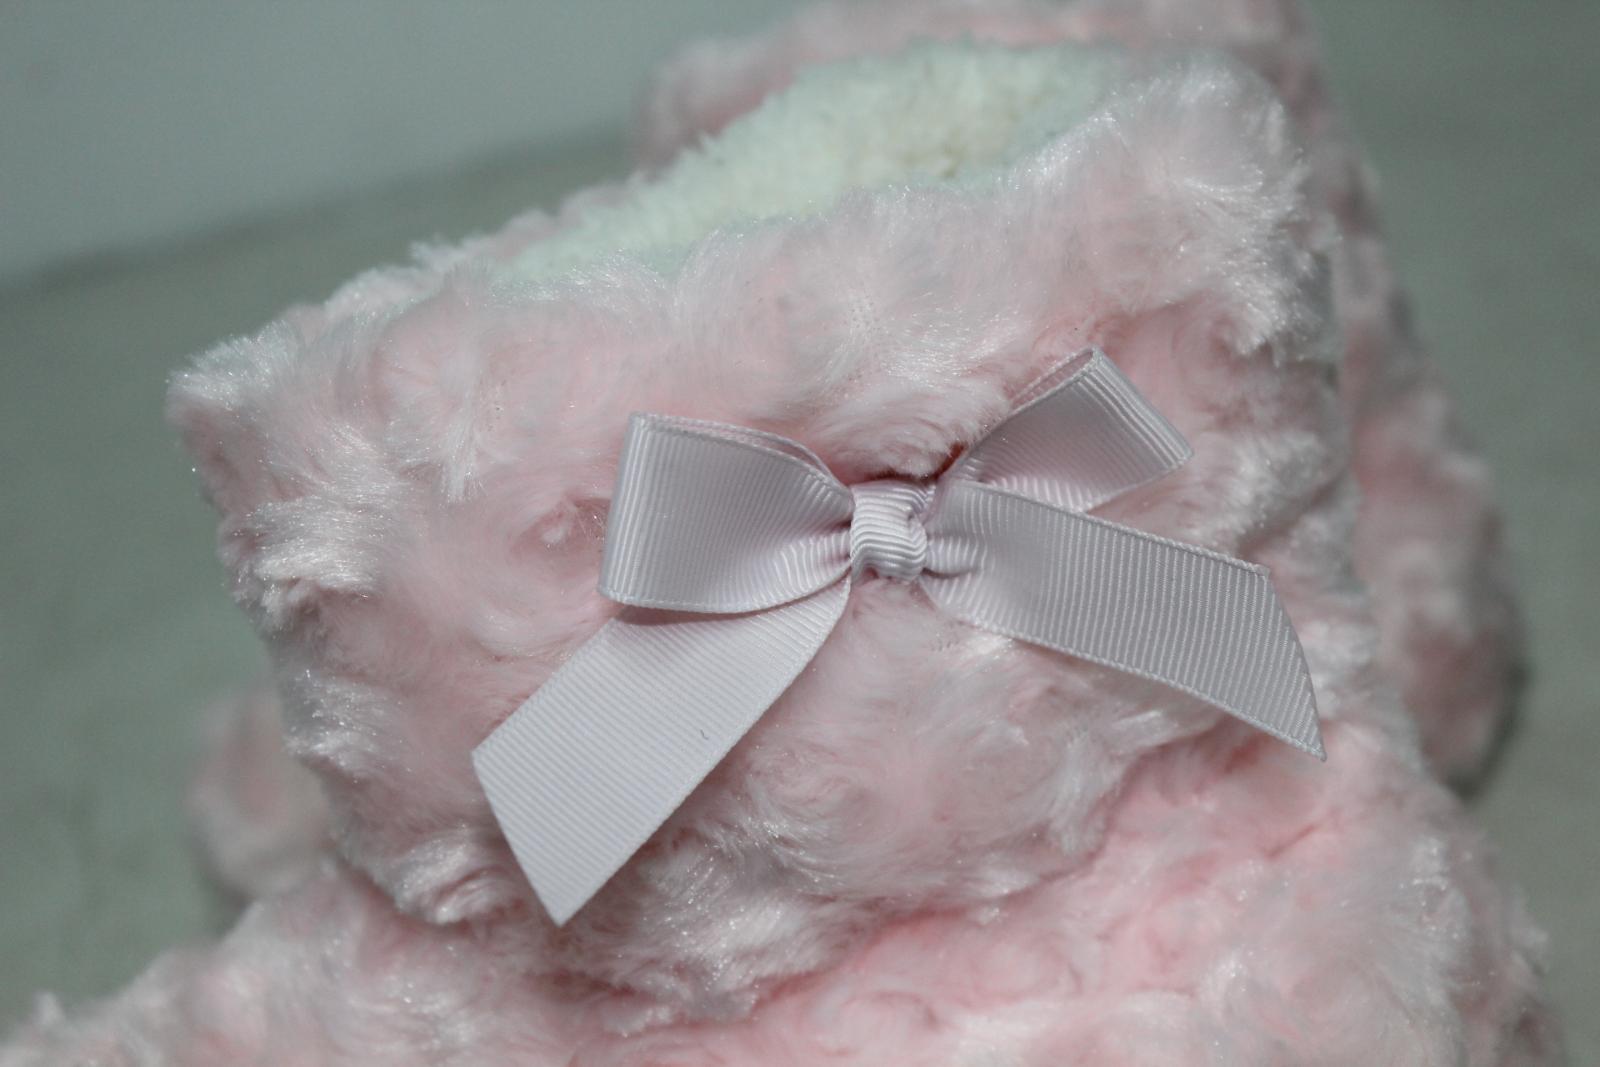 CHIC PRINCESS Girls Pink Fluffy Winter Warm Slipper Shoe Boots UK5 EU38 BNWT 6